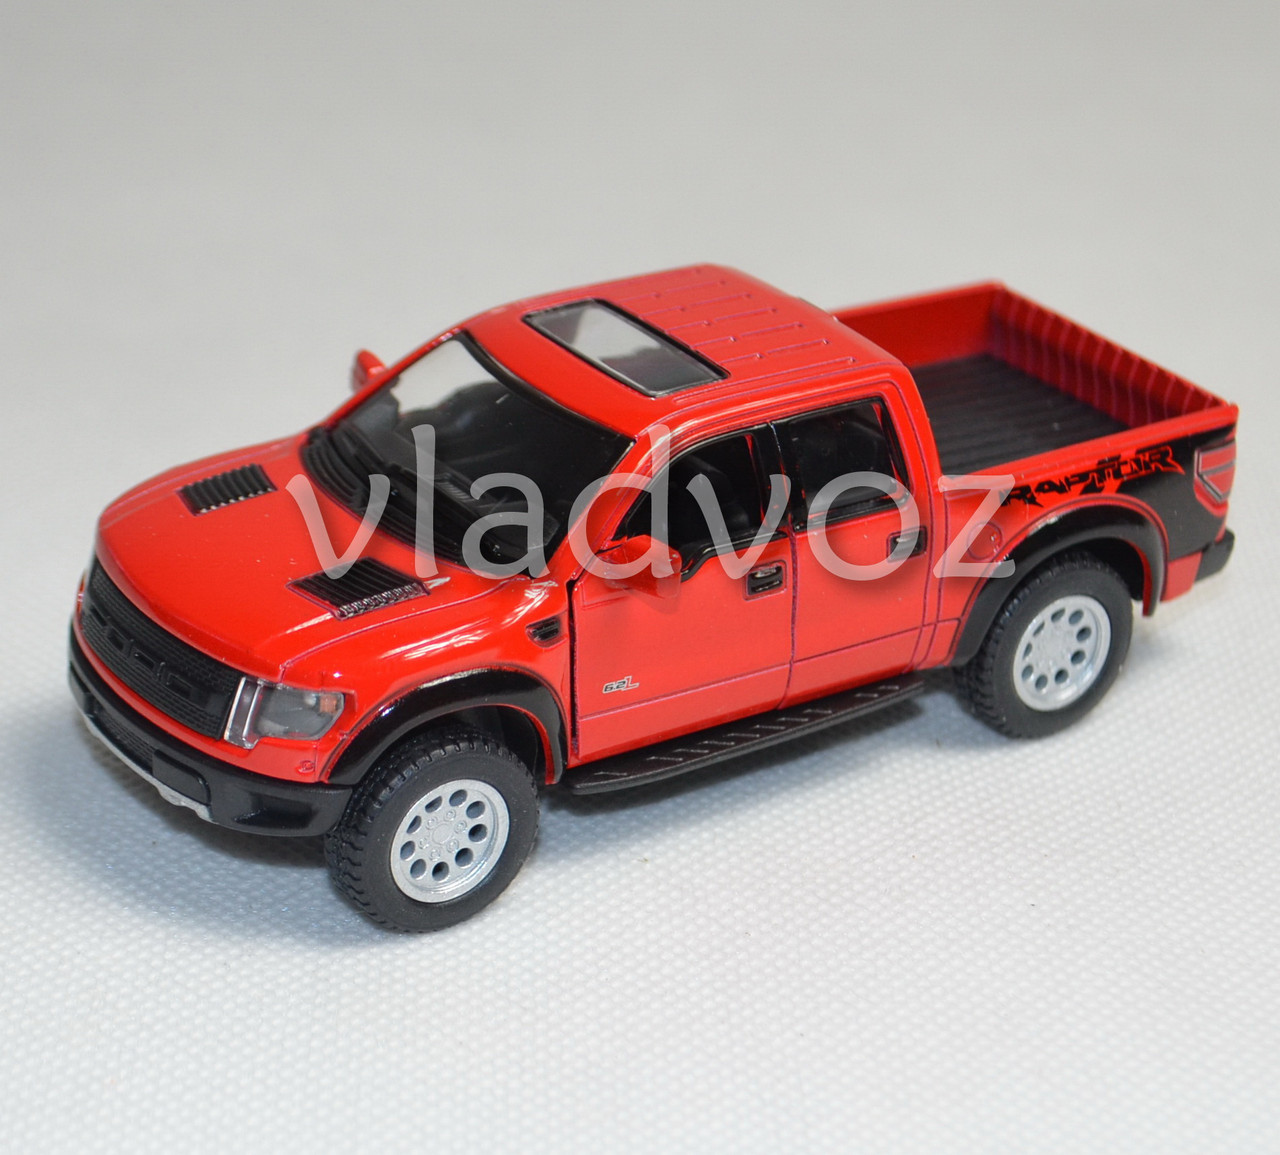 Машинка Ford Raptor Spercrew 150 1:32 метал красный